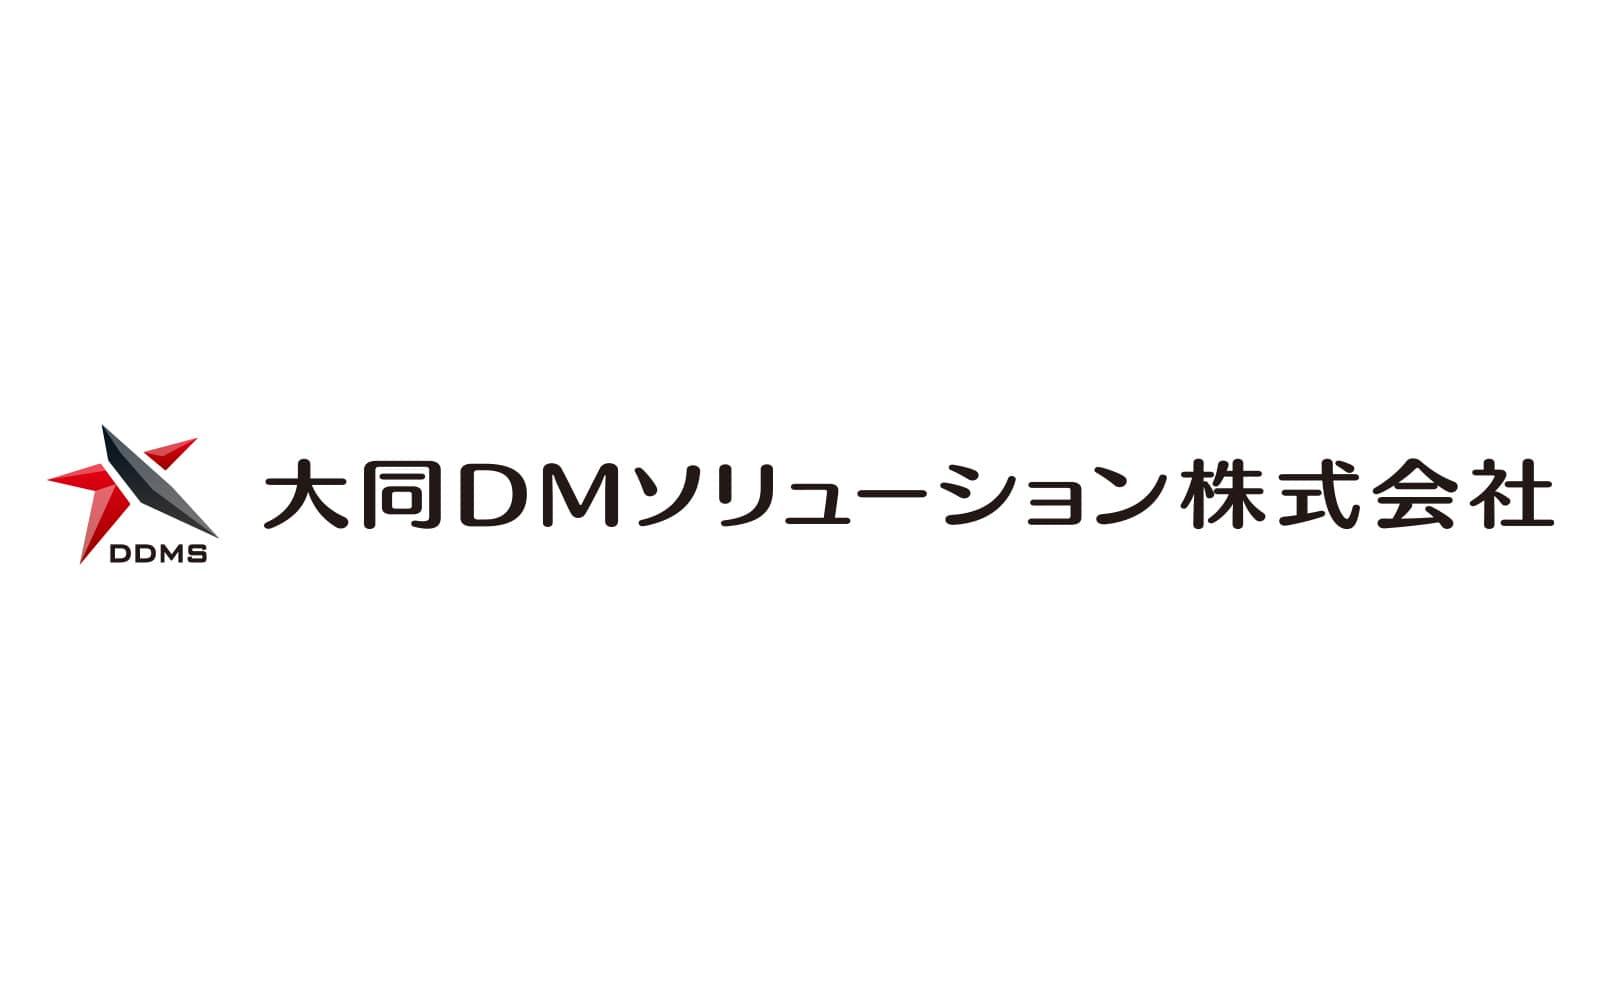 Dm ソリューション 大同